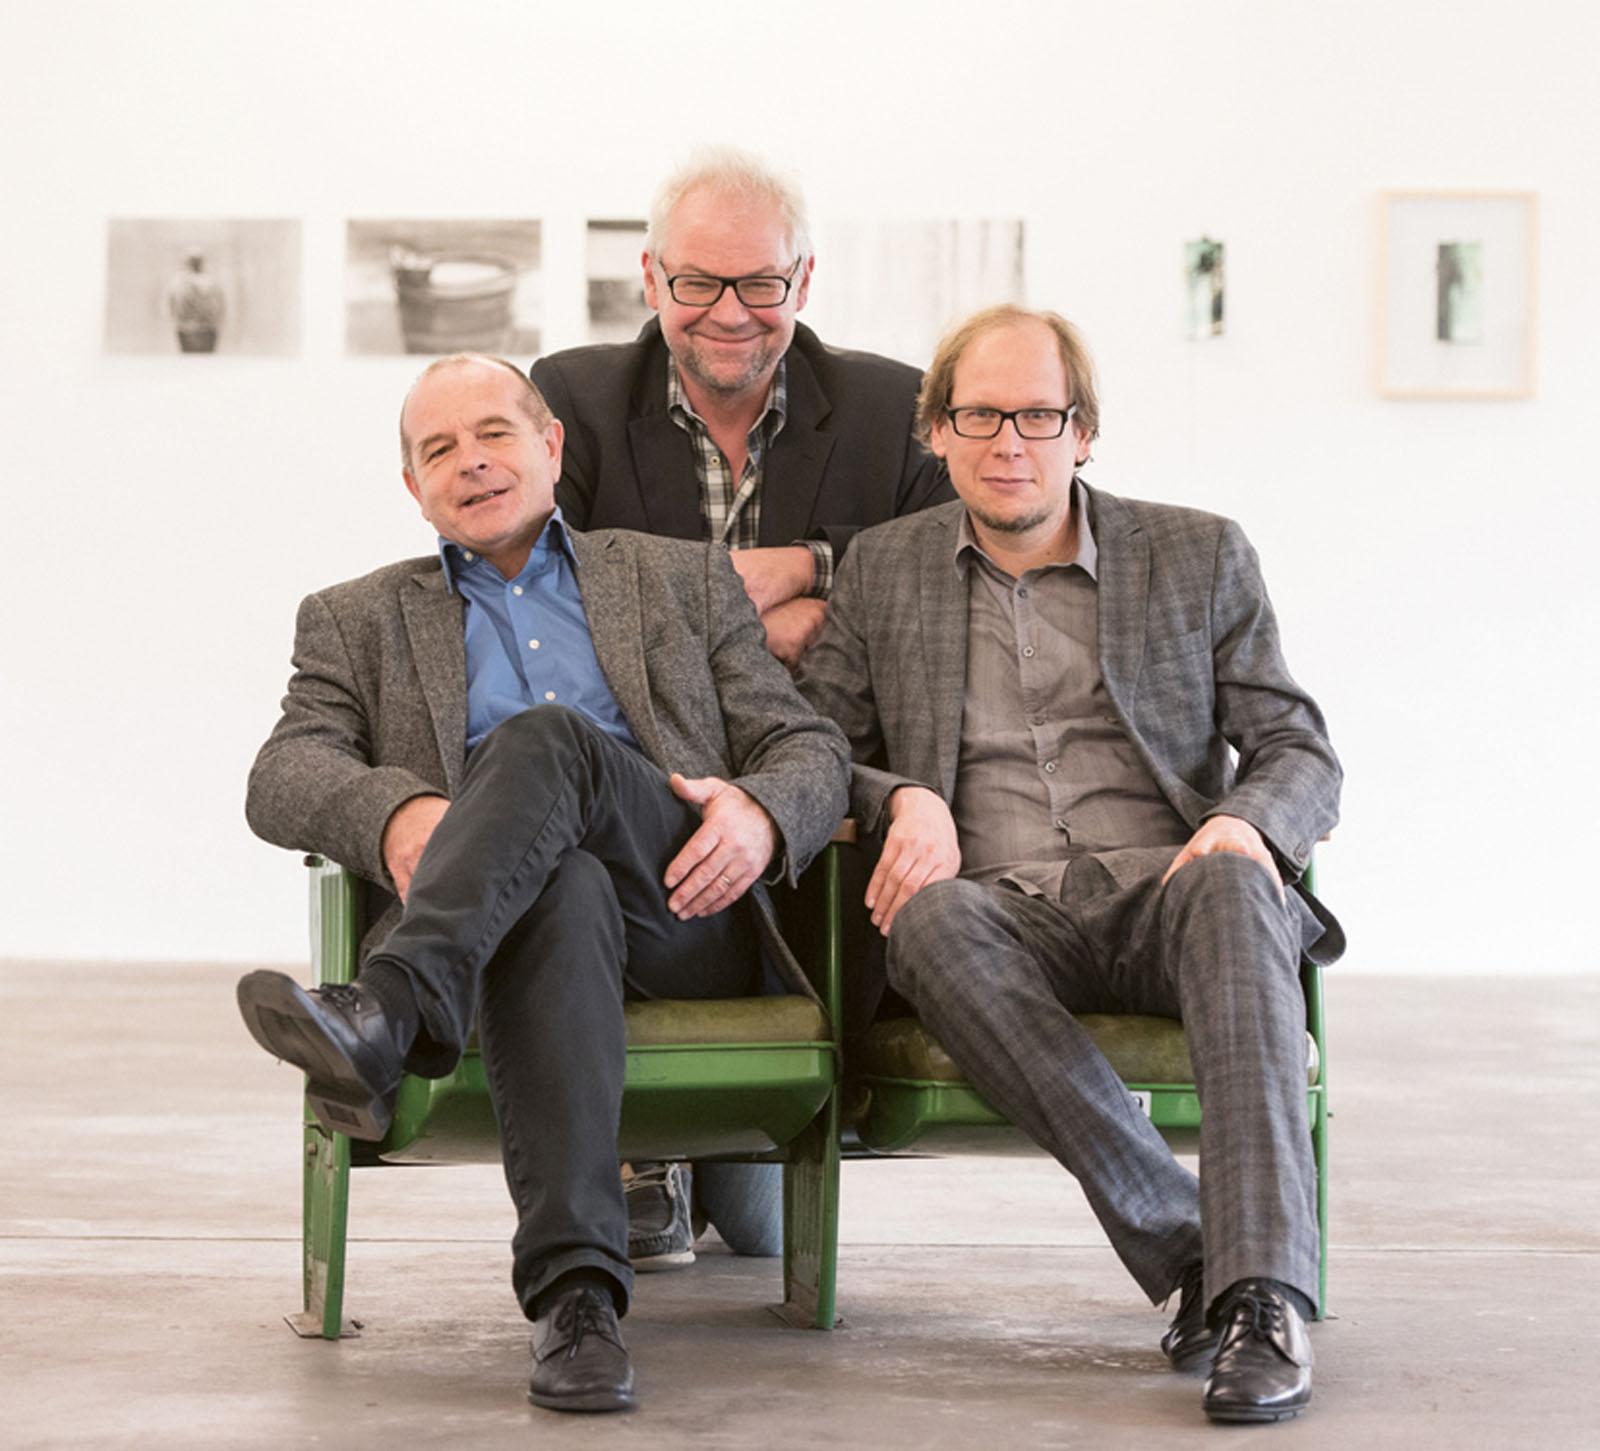 Lange Nacht der Museen Stuttgart - Galerienhaus Kerstan Merkle Schacher